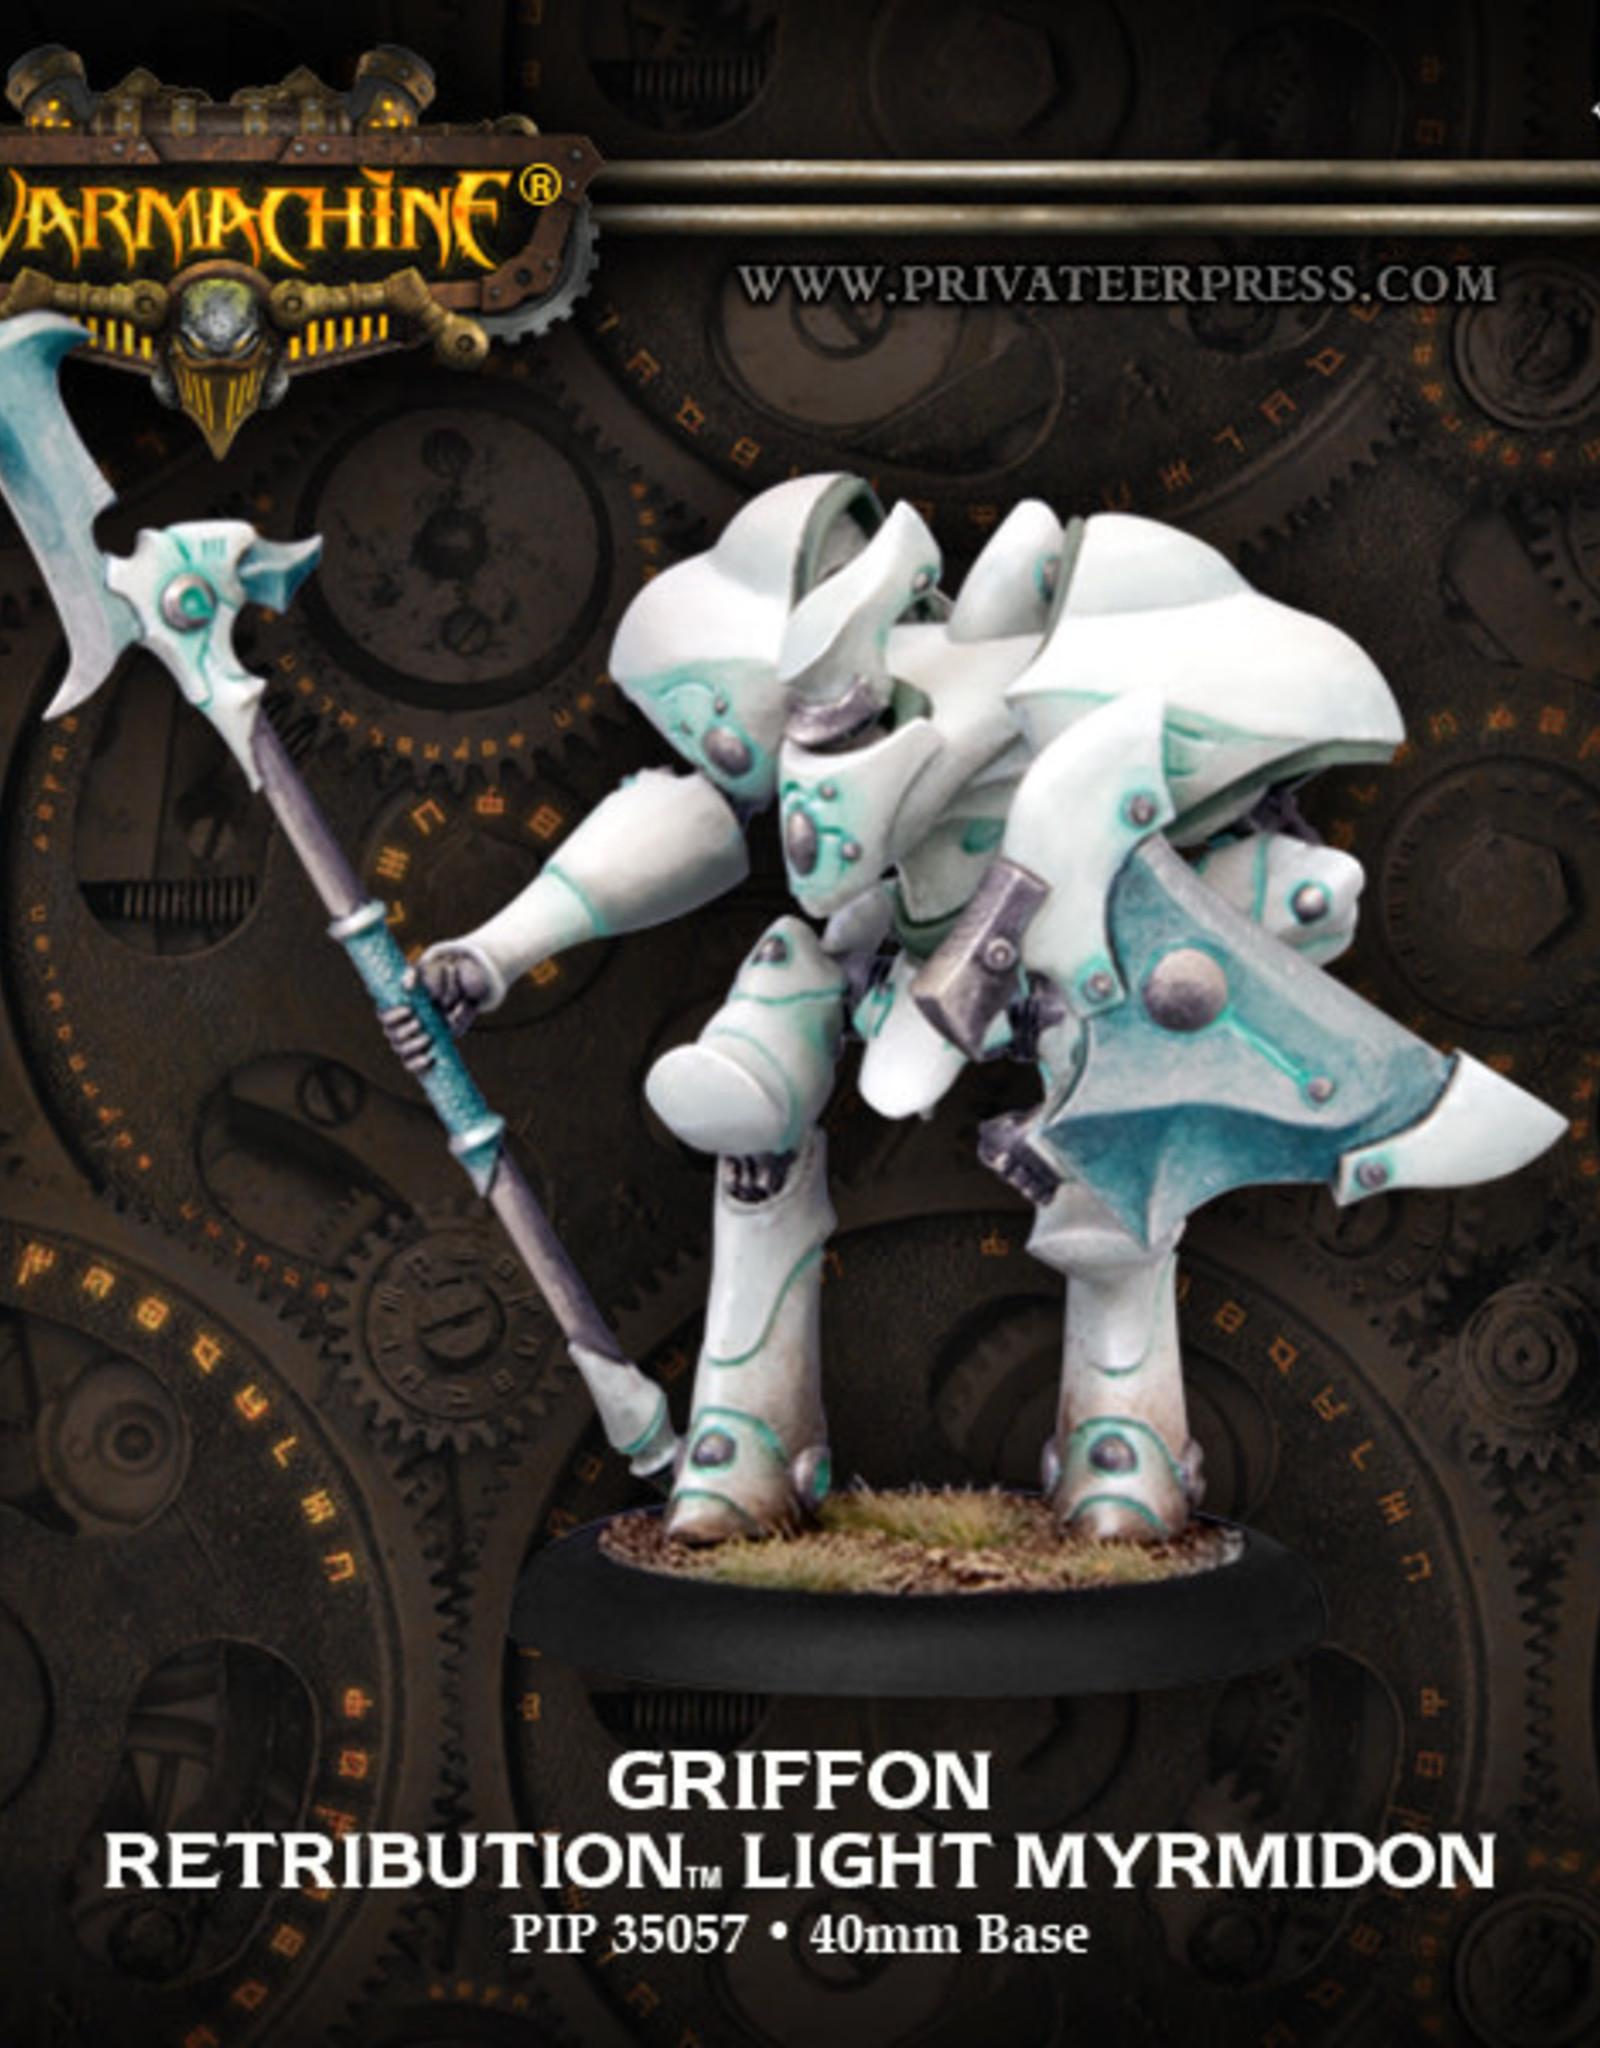 Warmachine Scyrah - Griffon